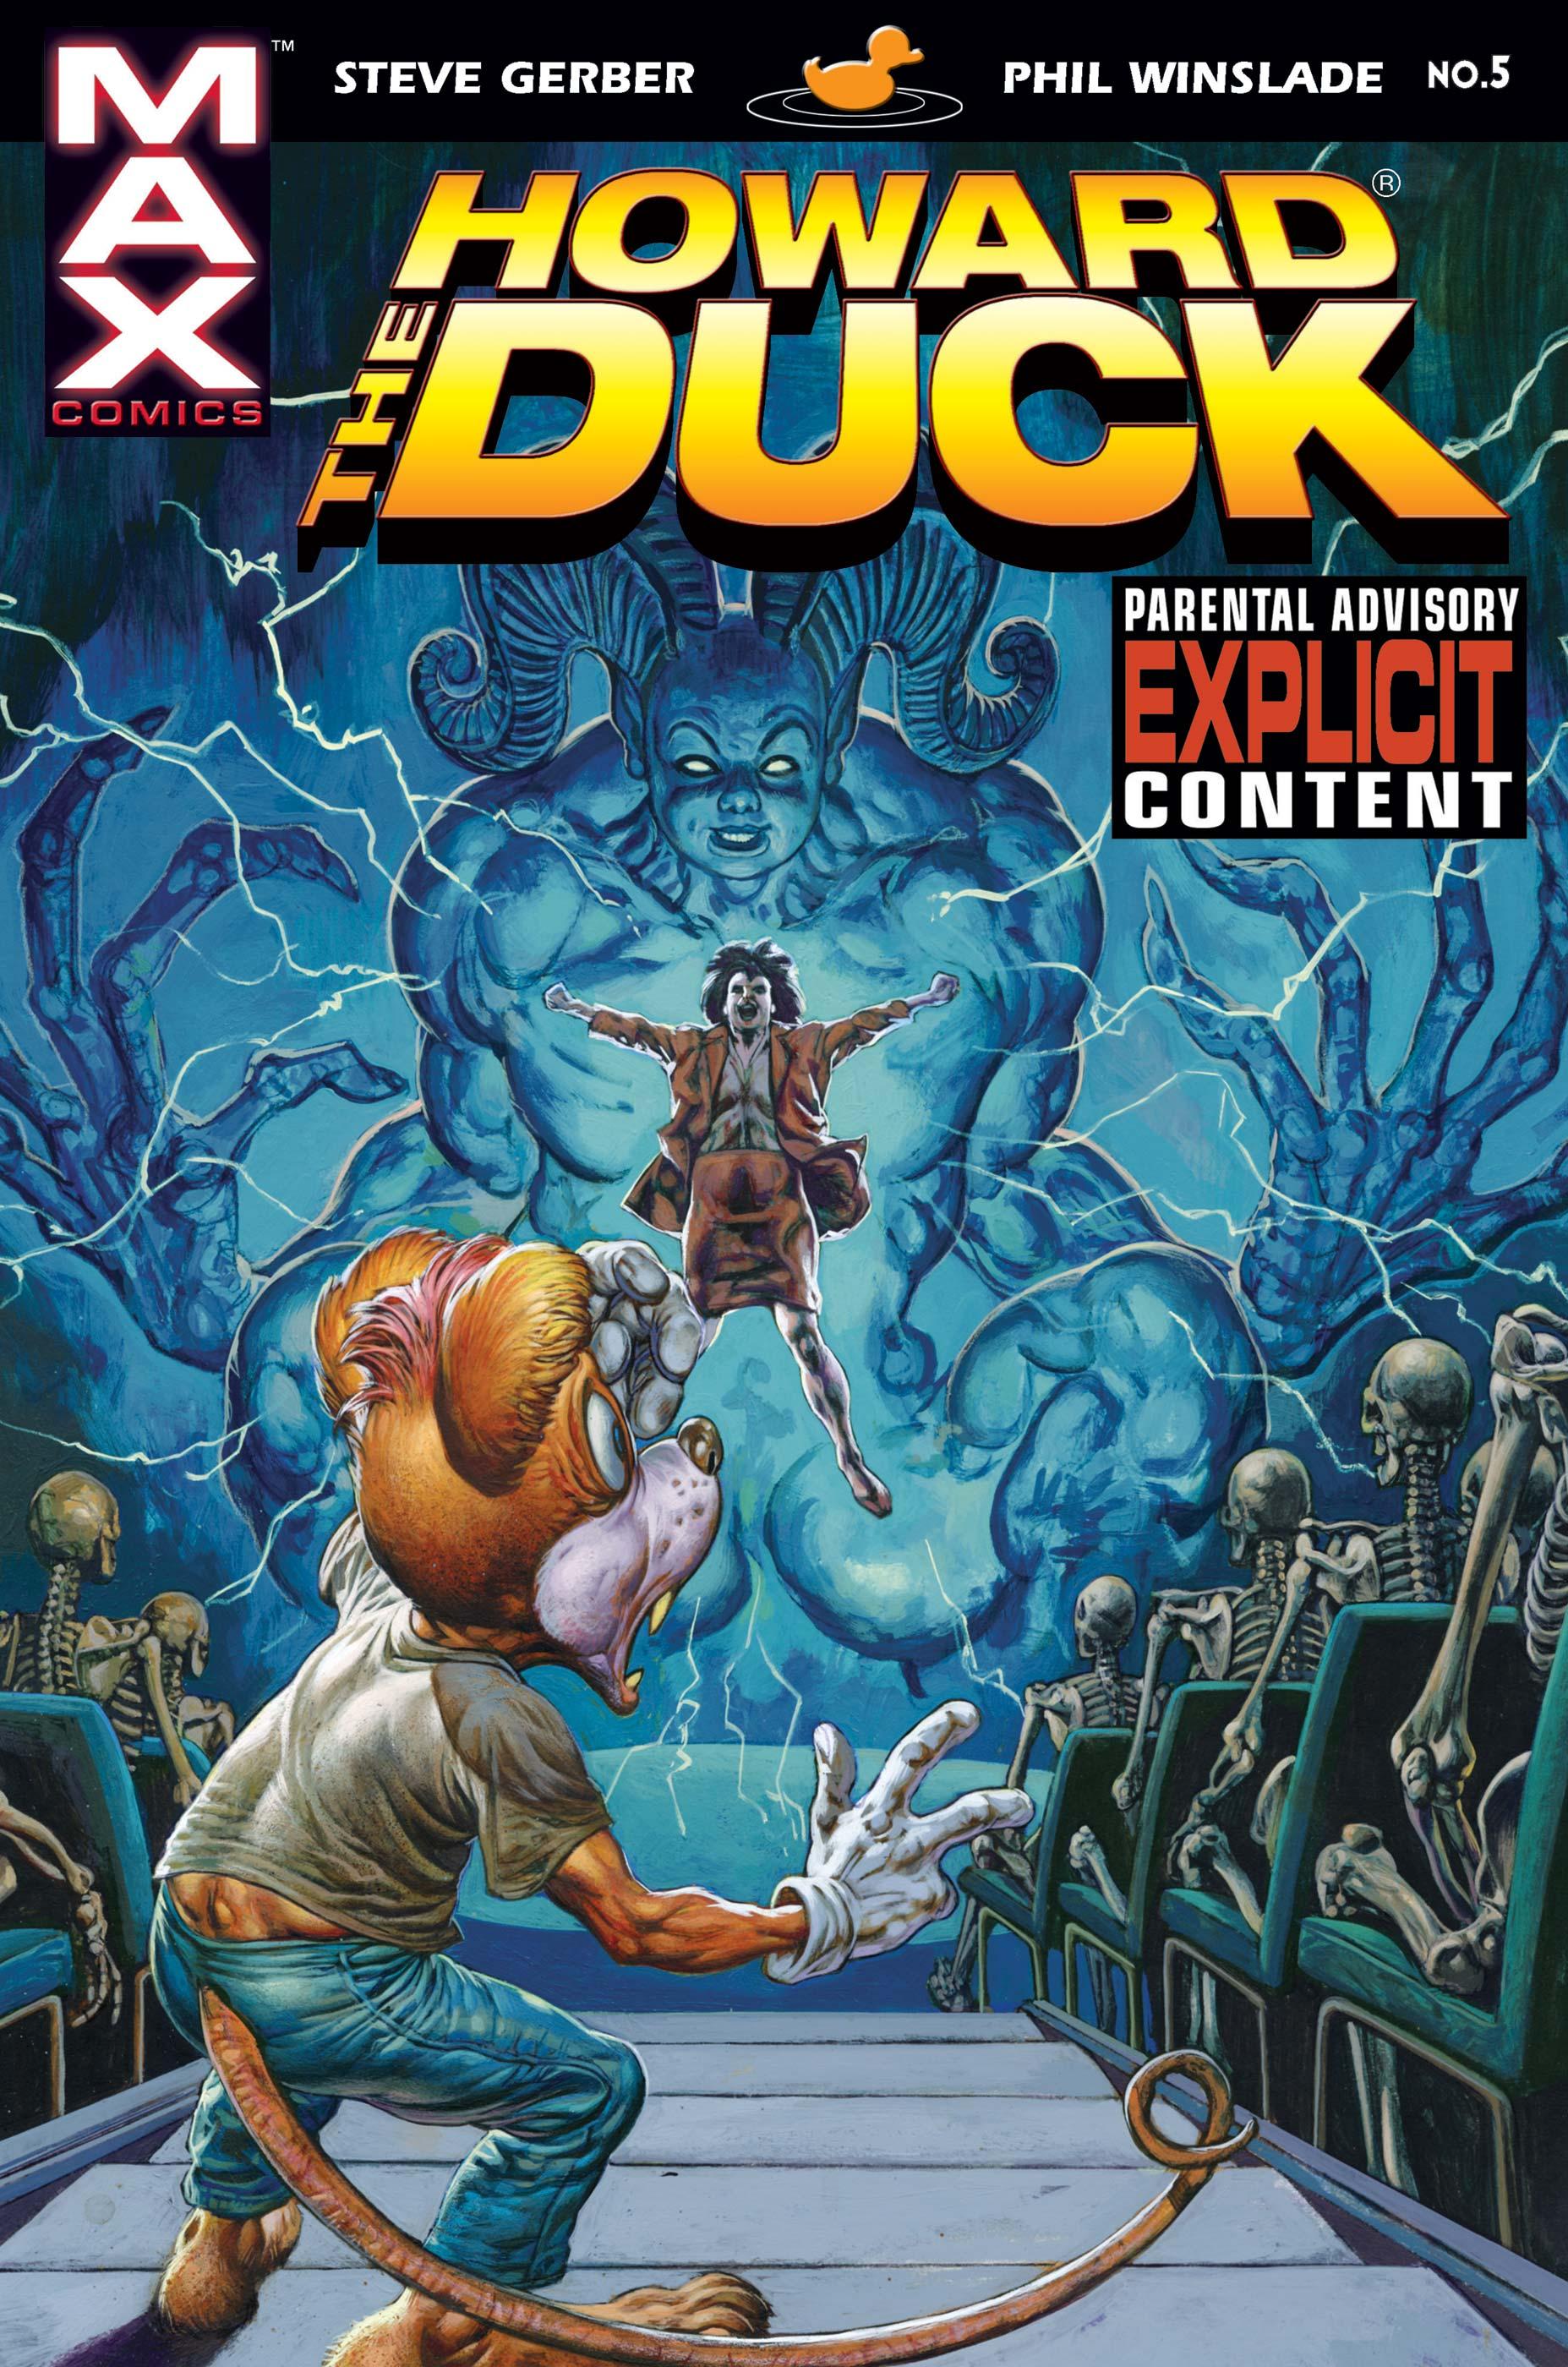 HOWARD THE DUCK # 5 : VERY FINE : SEP 1976 :MARVEL COMICS. {COMIC BOOKS}